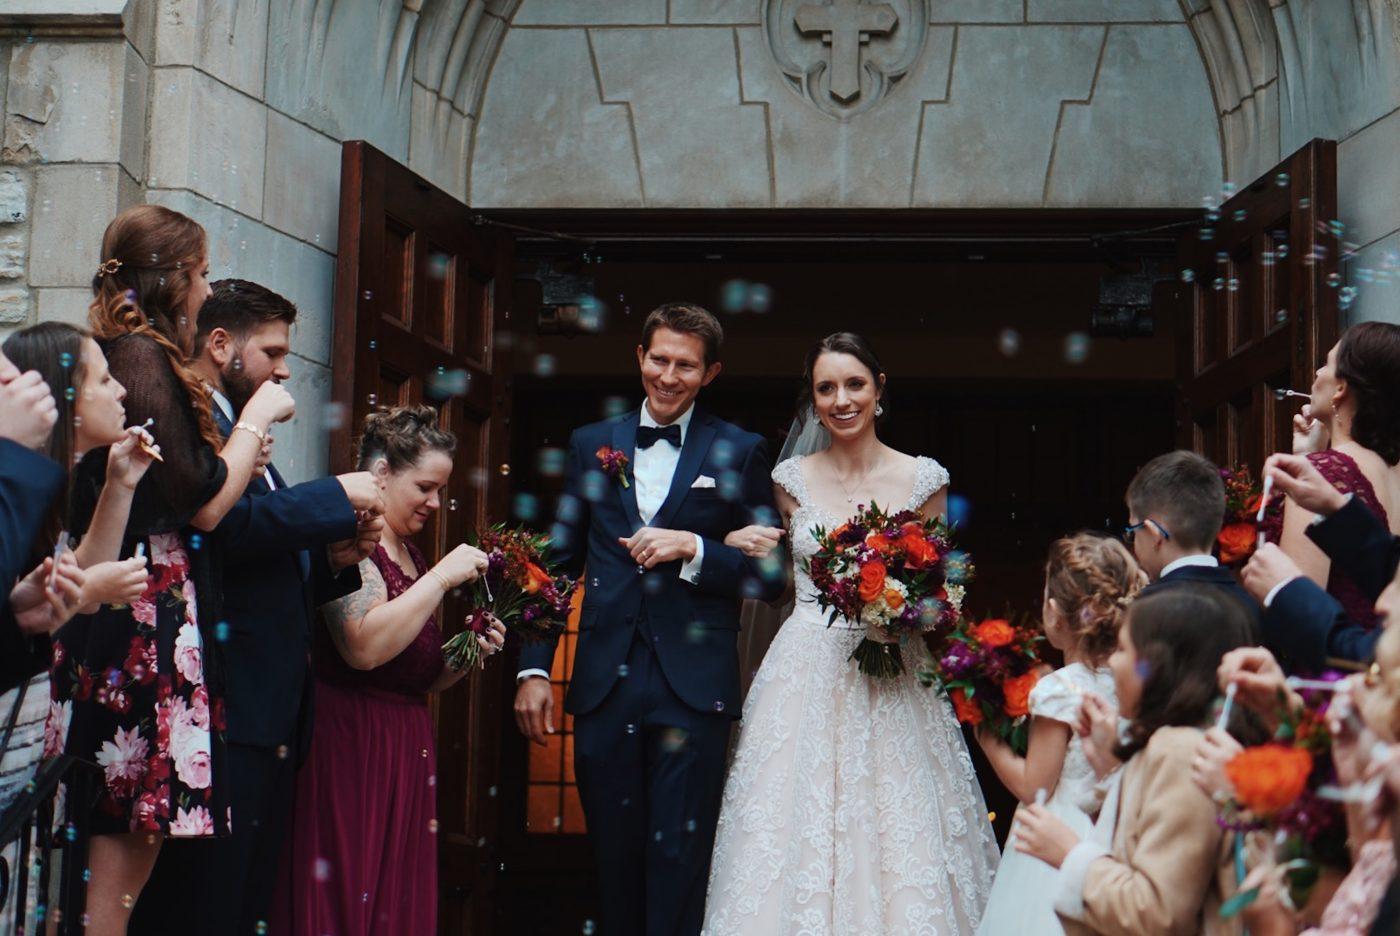 CIVIL WEDDING VS A CHURCH WEDDING